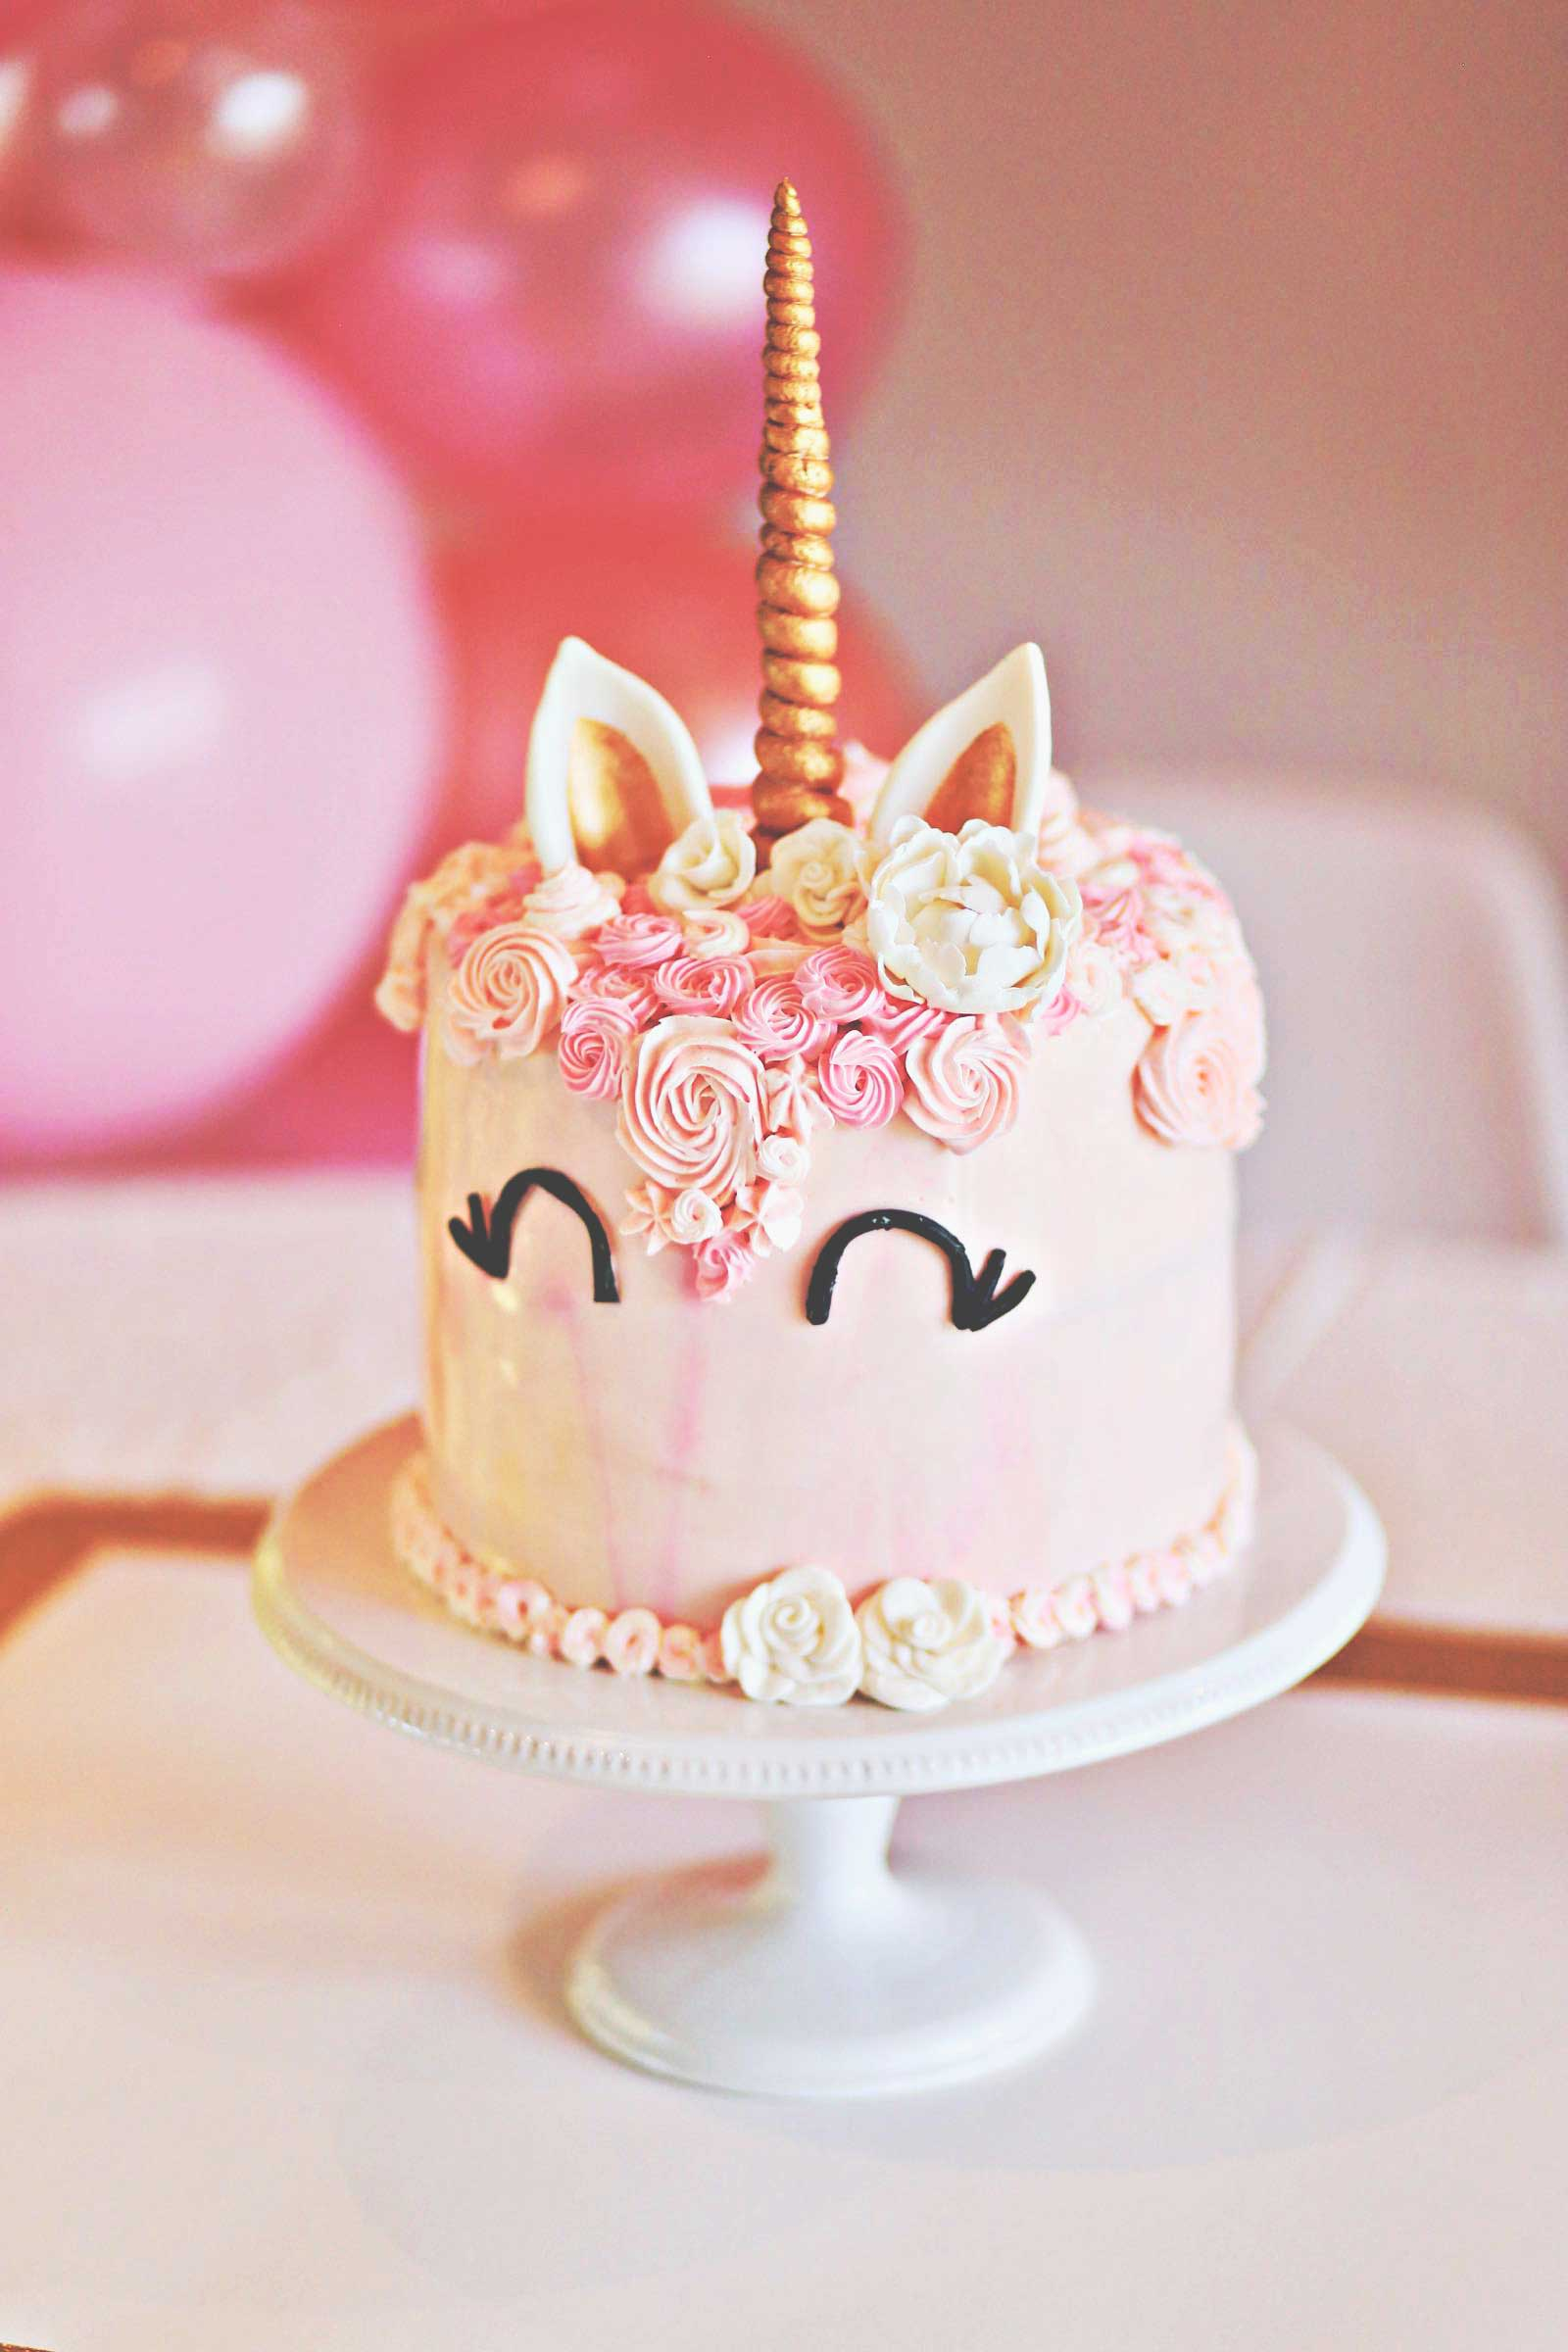 Penny S Unicorn Cake Amp Party The Budget Babe